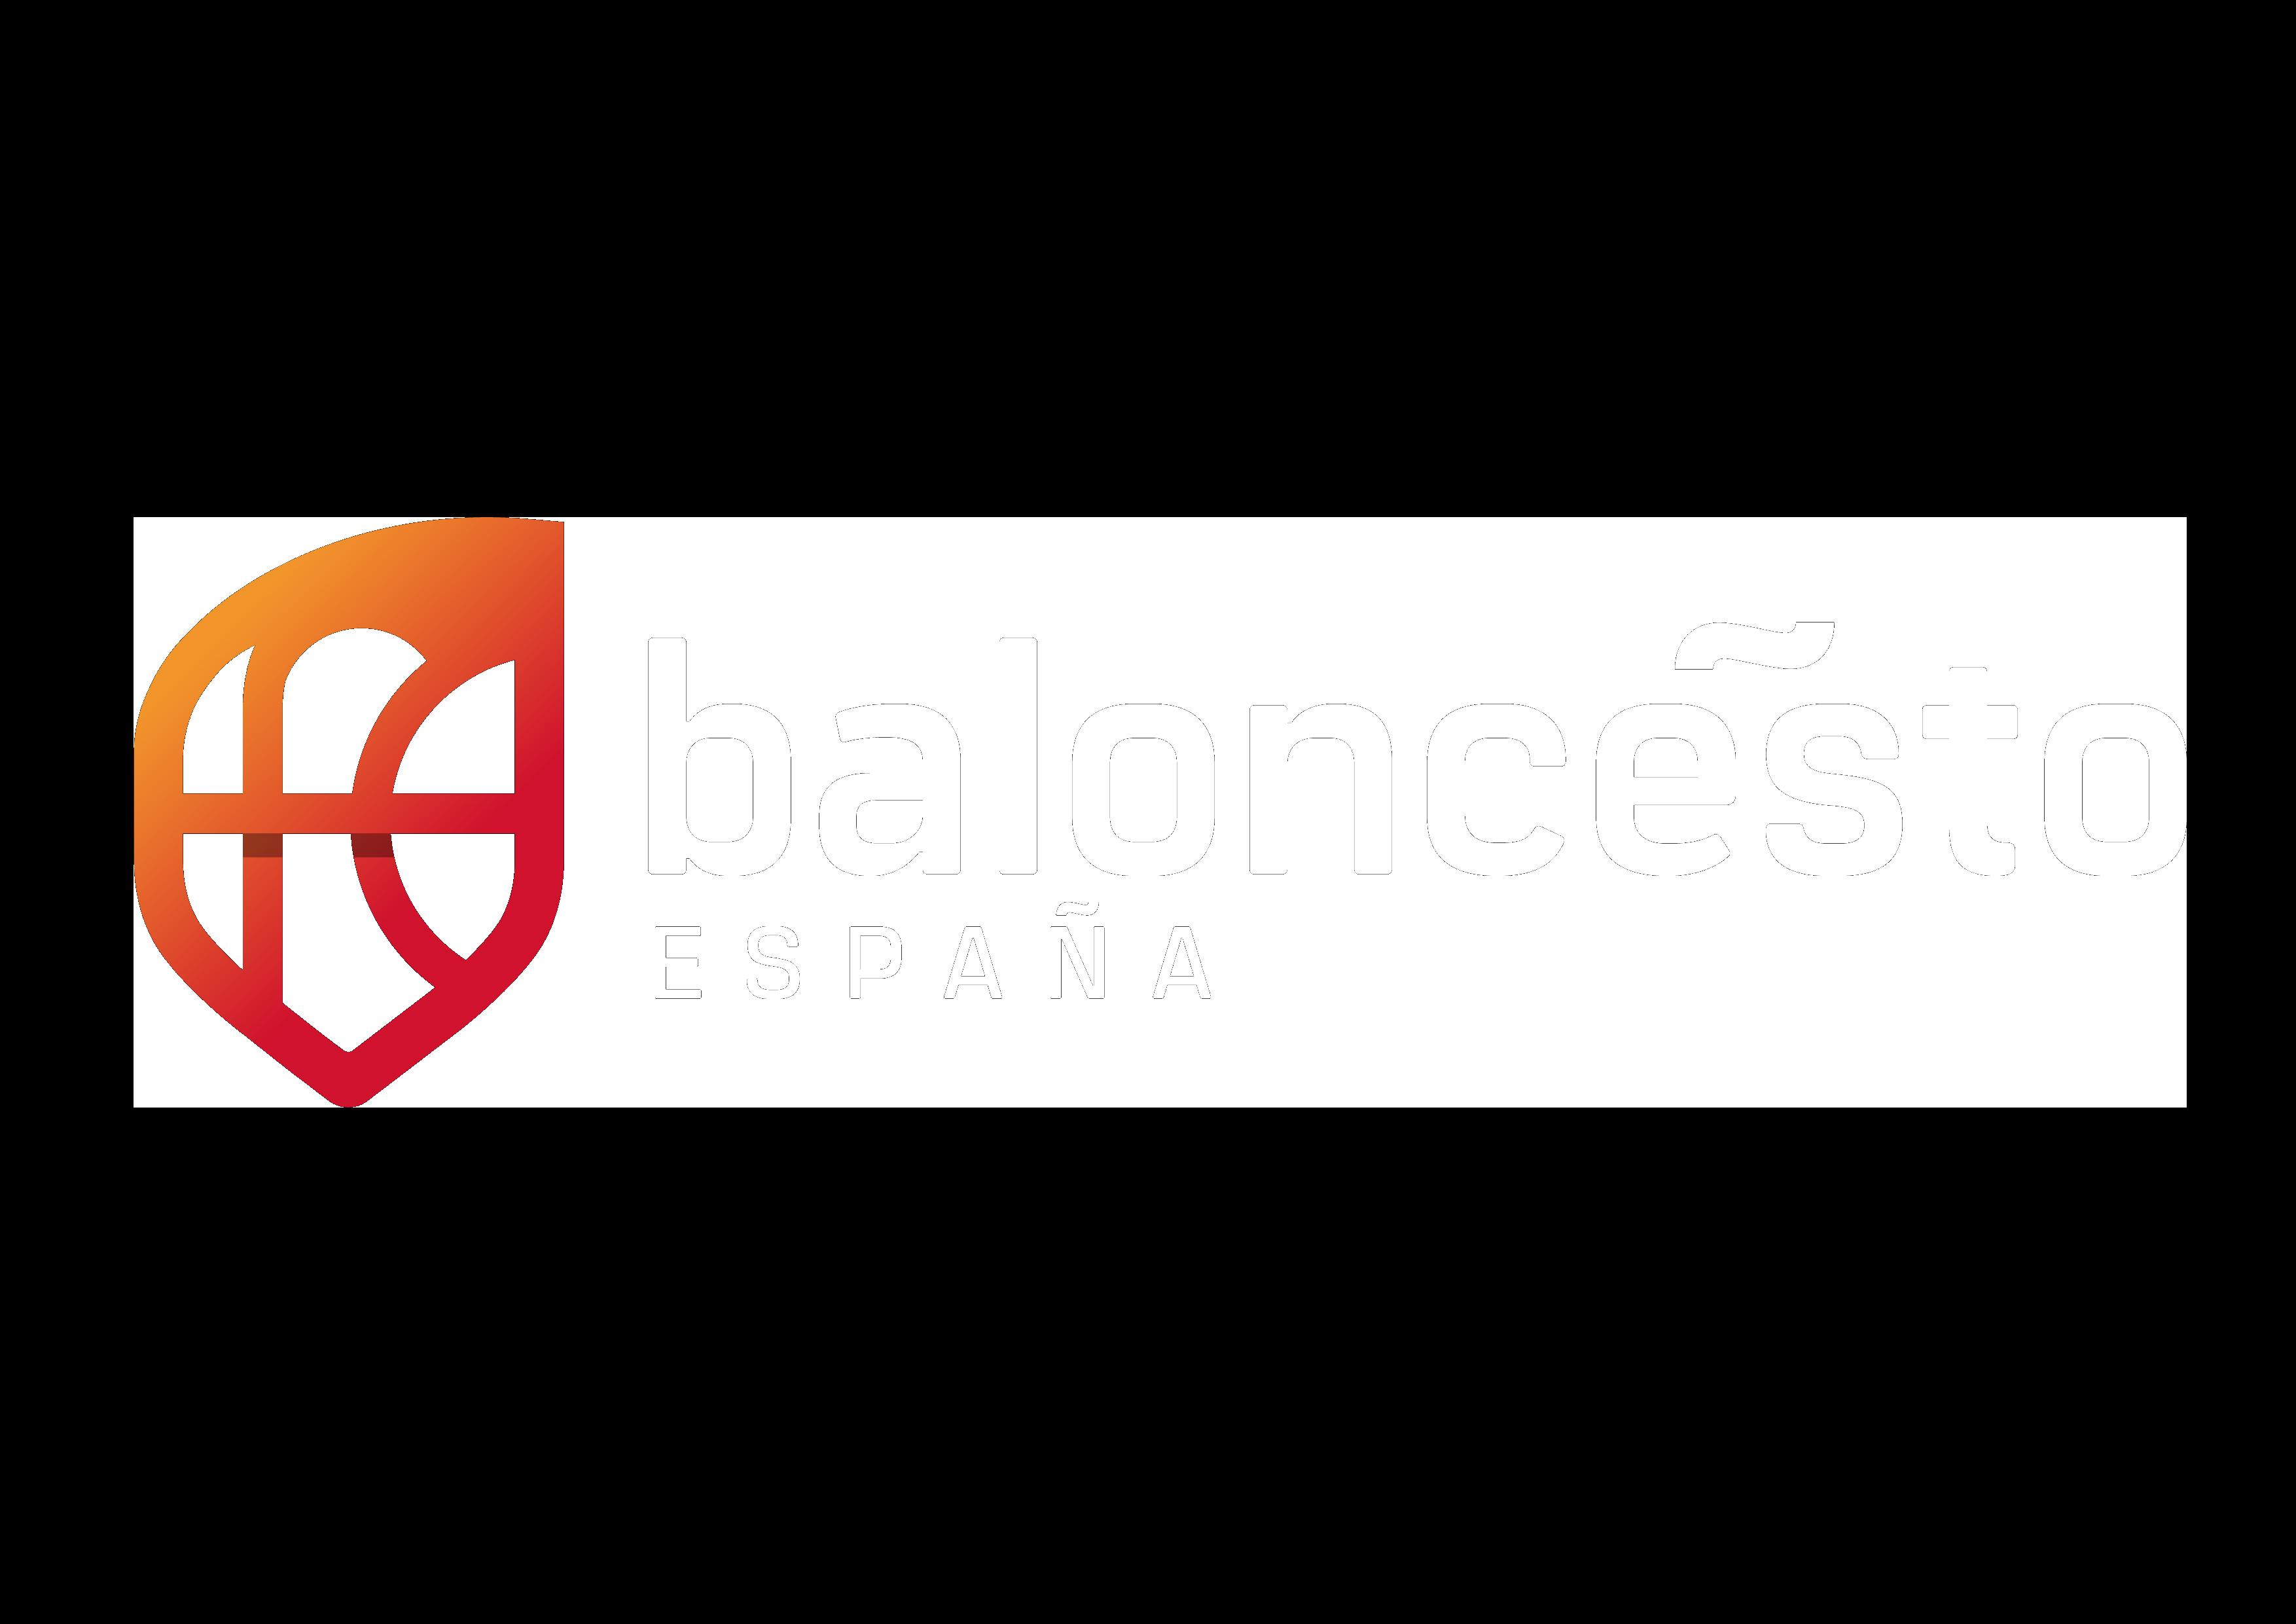 CLUB BALONCESTO AVENIDA